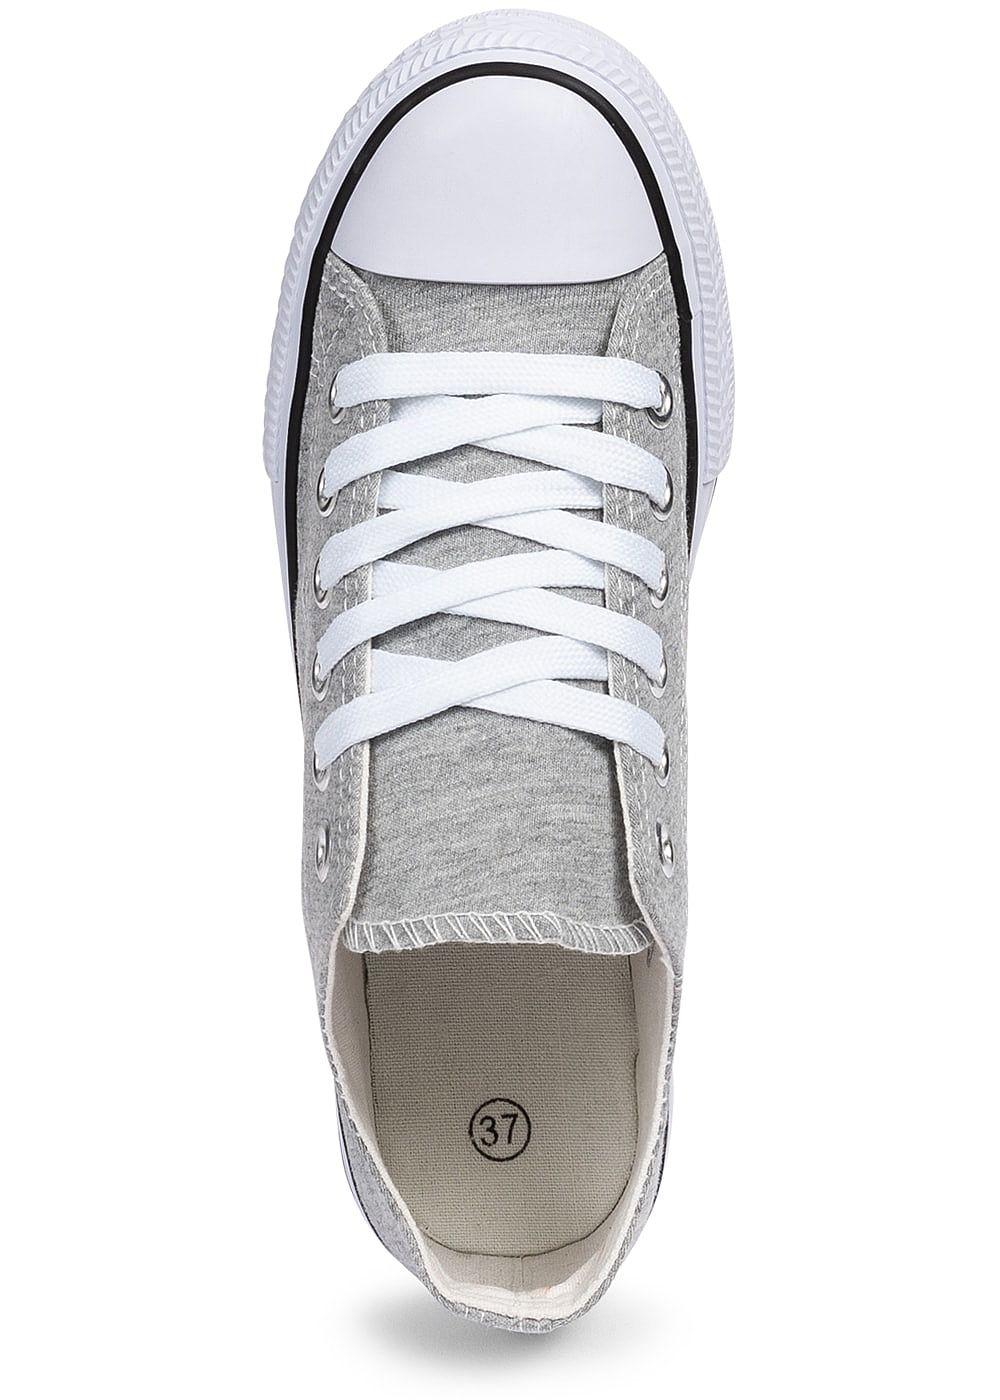 3e3d7f41712ba9 Seventyseven Lifestyle Damen Schuh Canvas-Sneaker hell grau ...